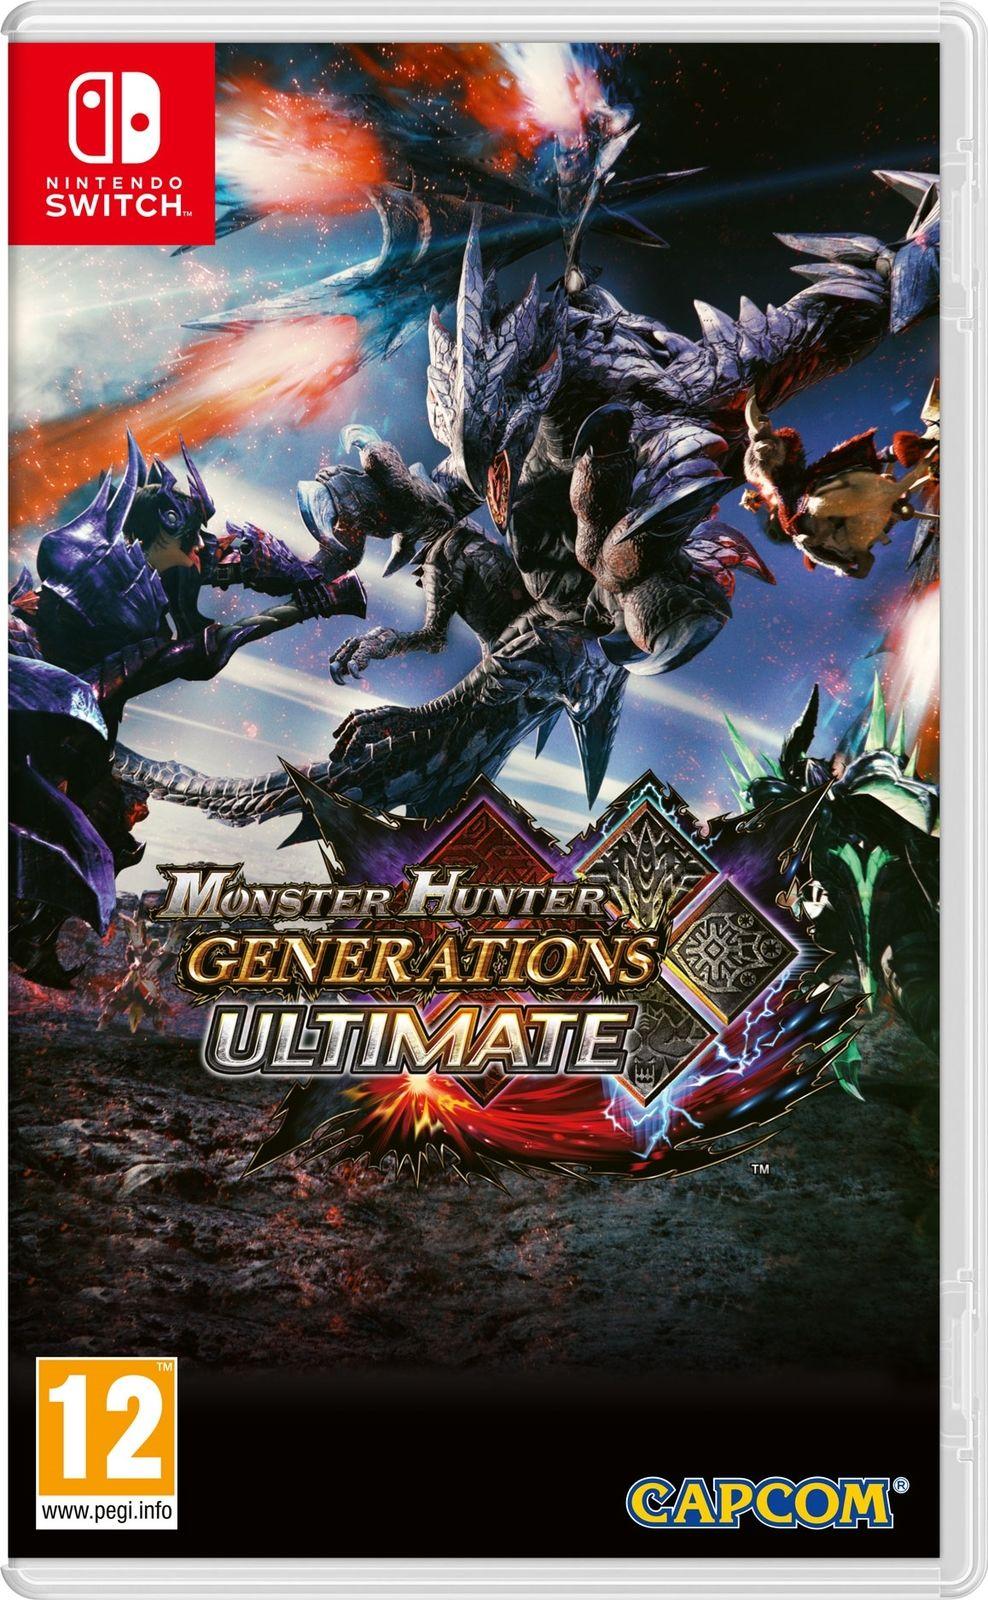 PREORDER Monster Hunter Generations Ultimate for Nintendo Switch £33.87 using code PIGGYBANK on ebay / ShopTo